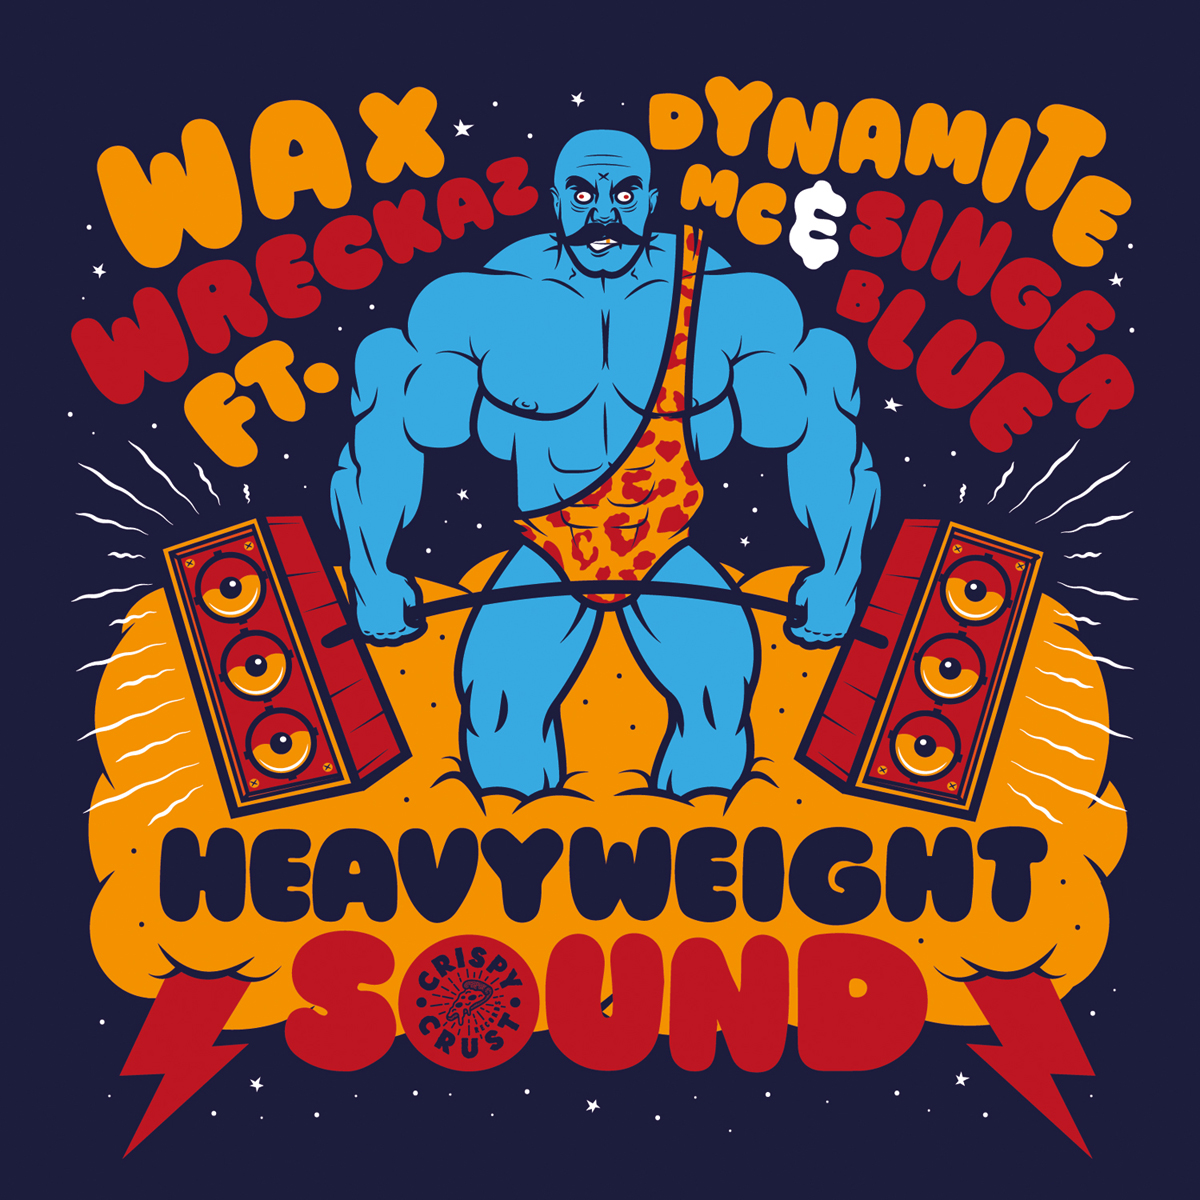 Wax_Wreckaz_Heavyweight_Sound_1200x1200px